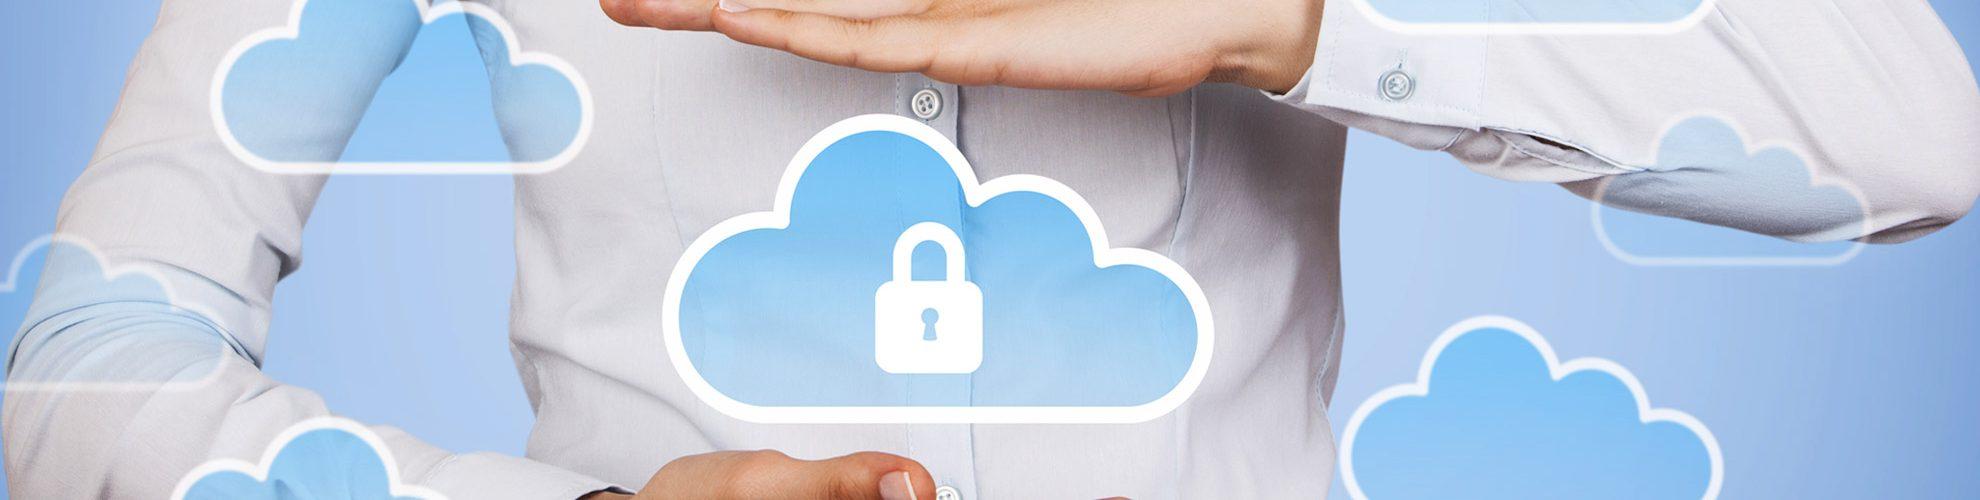 data-storage-sicurezza-dati